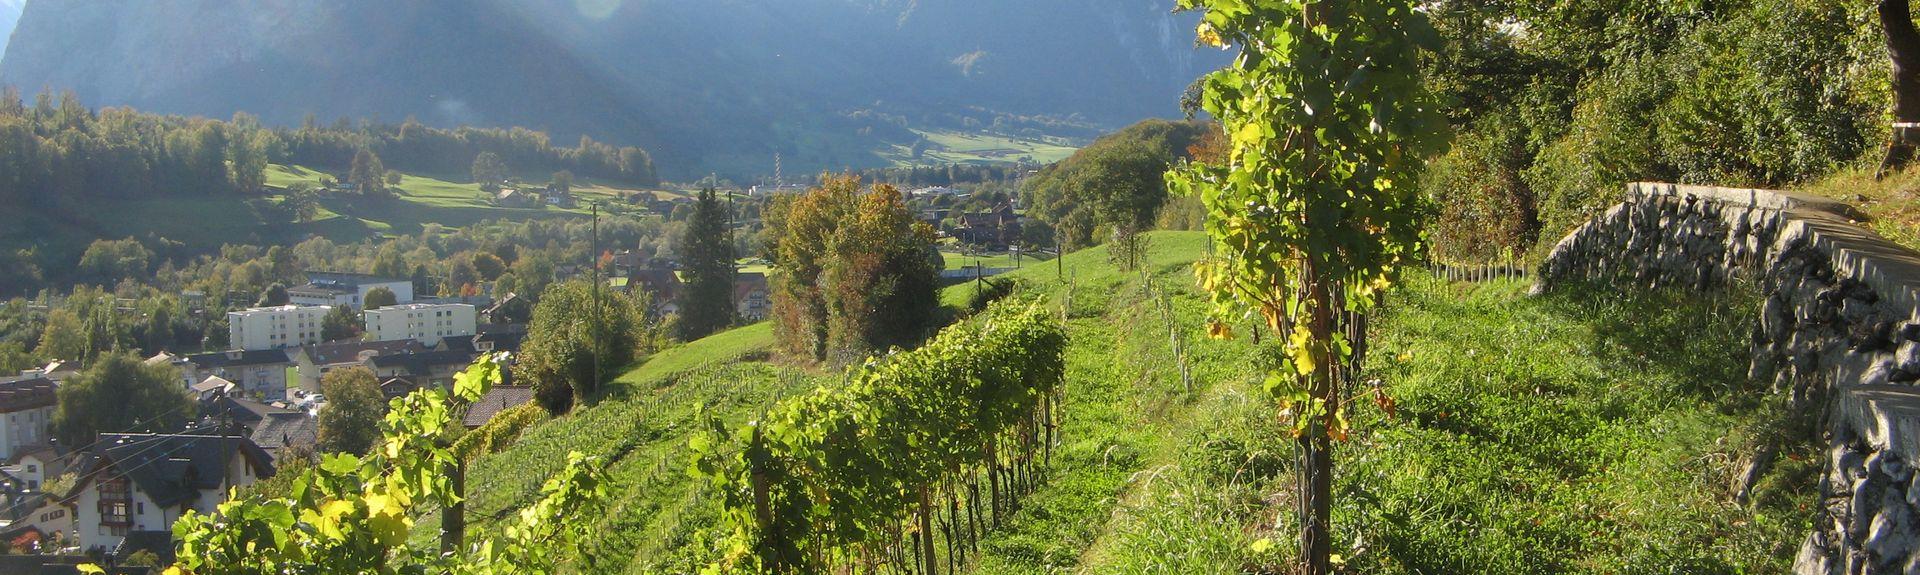 Eriz, Switzerland